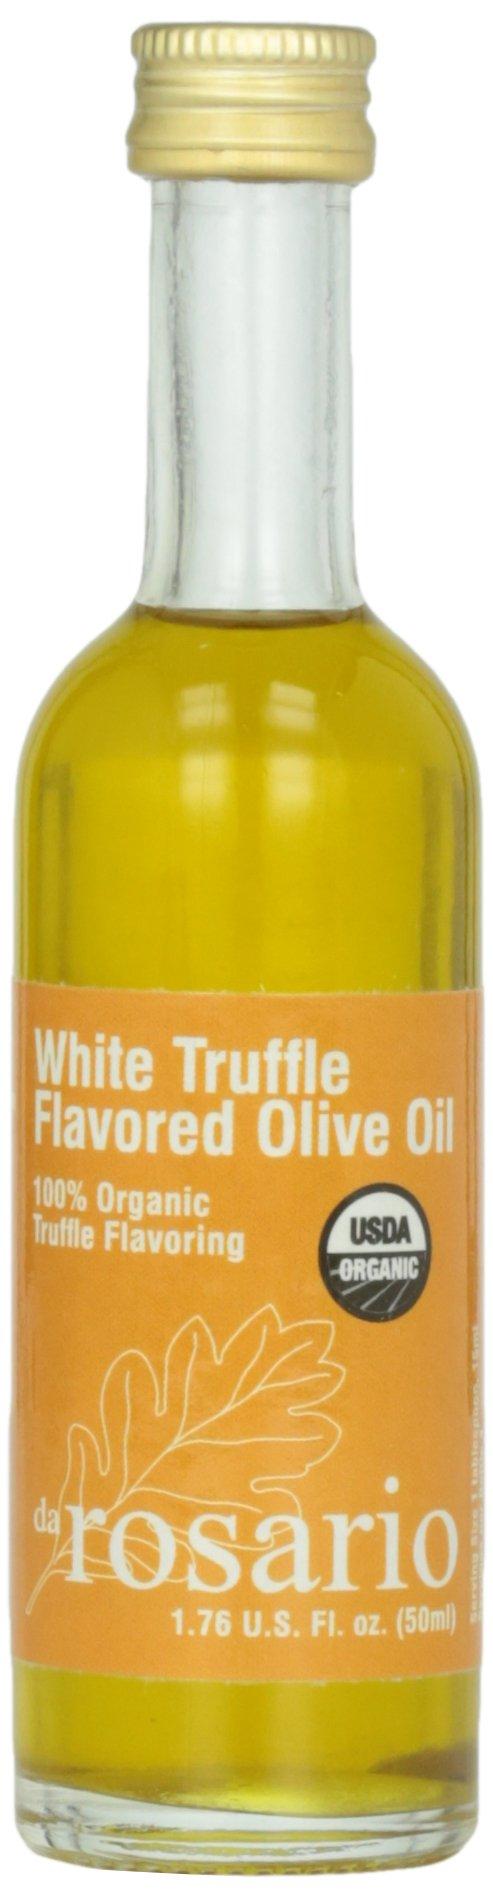 Da Rosario 100% Organic White Truffle Flavored Olive Oil, 1.76-Ounce Glass Bottle